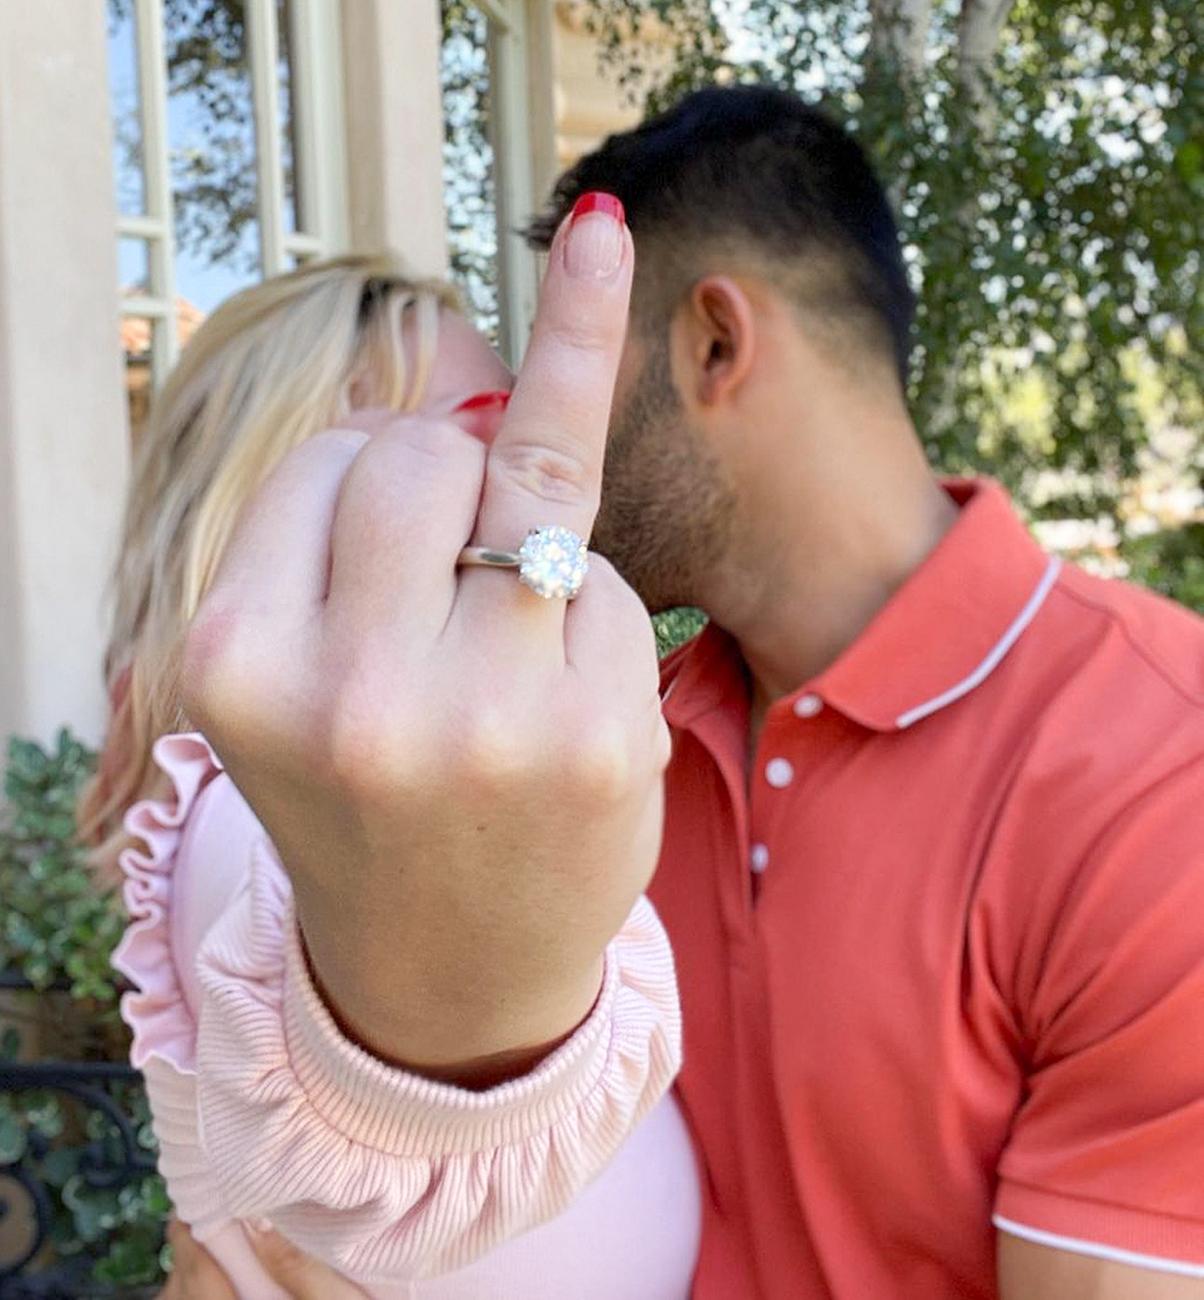 Октавия Спенсер лично извинилась перед Бритни Спирс и ее женихом за неудачную шутку-Фото 3